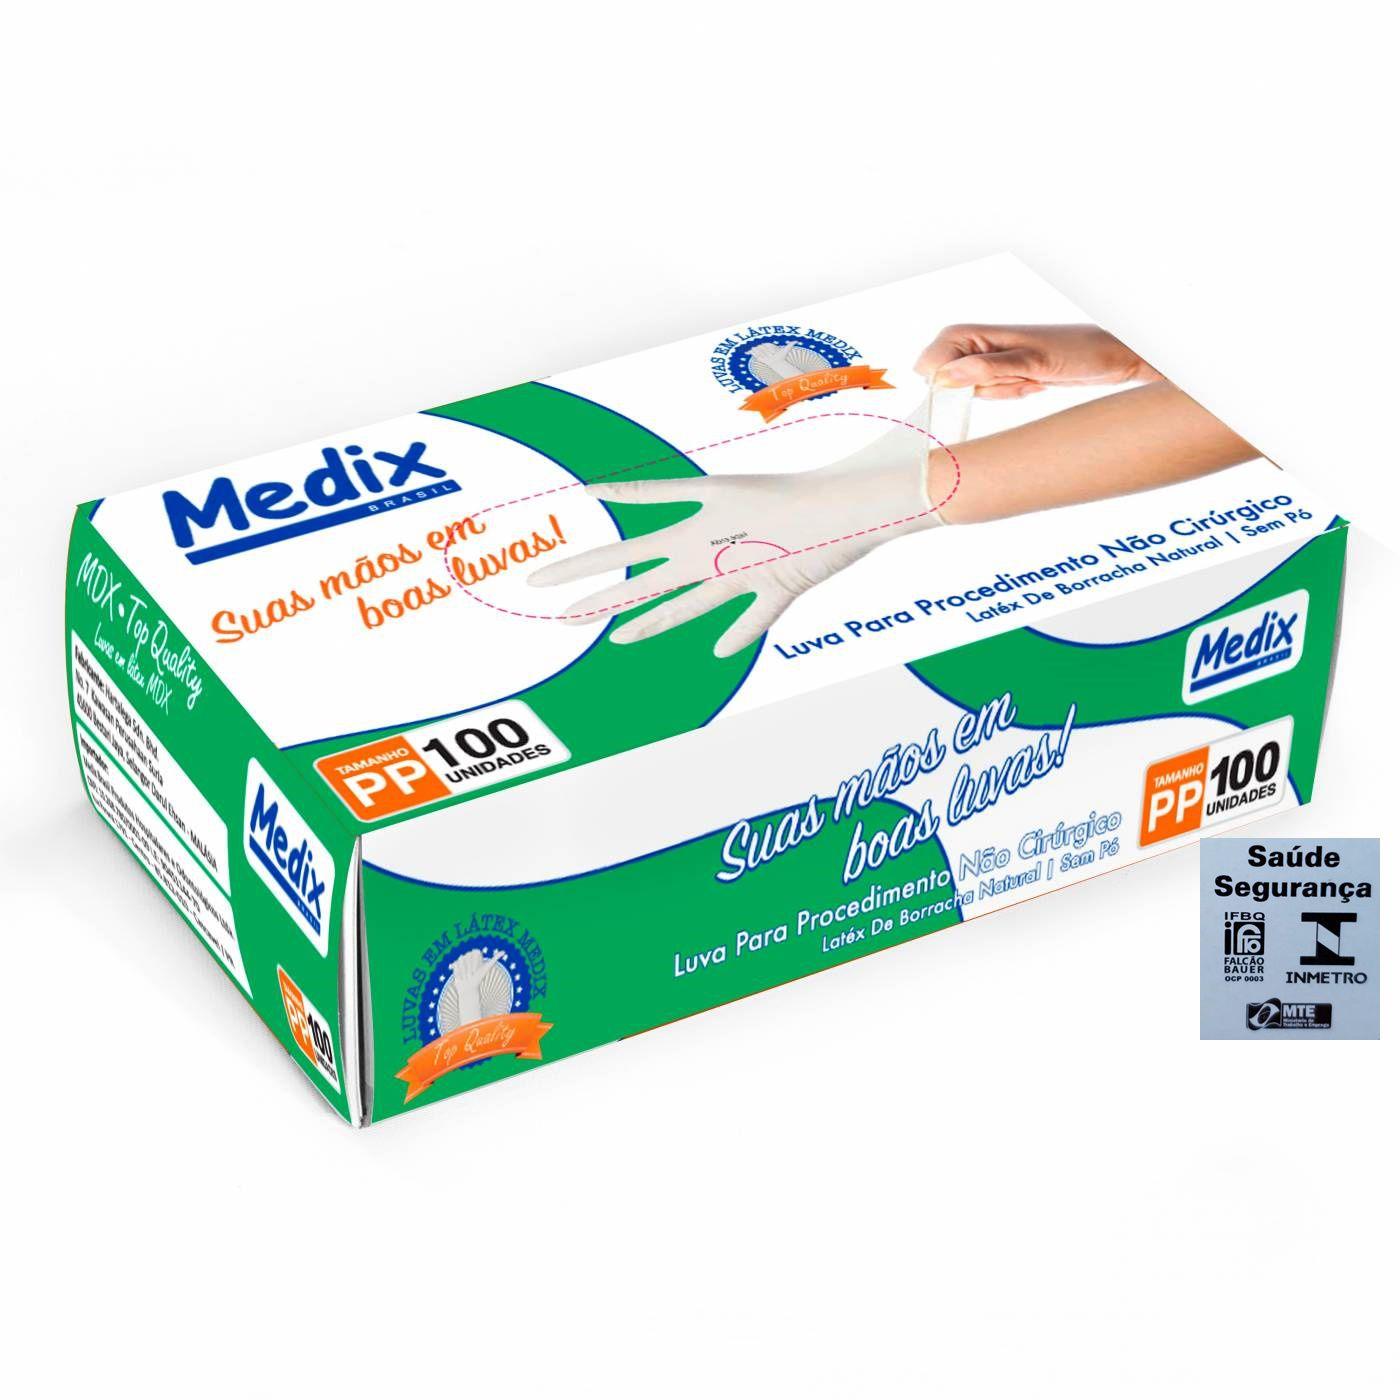 Luva de Procedimentos sem pó - Caixa c/10 Unidades - Medix